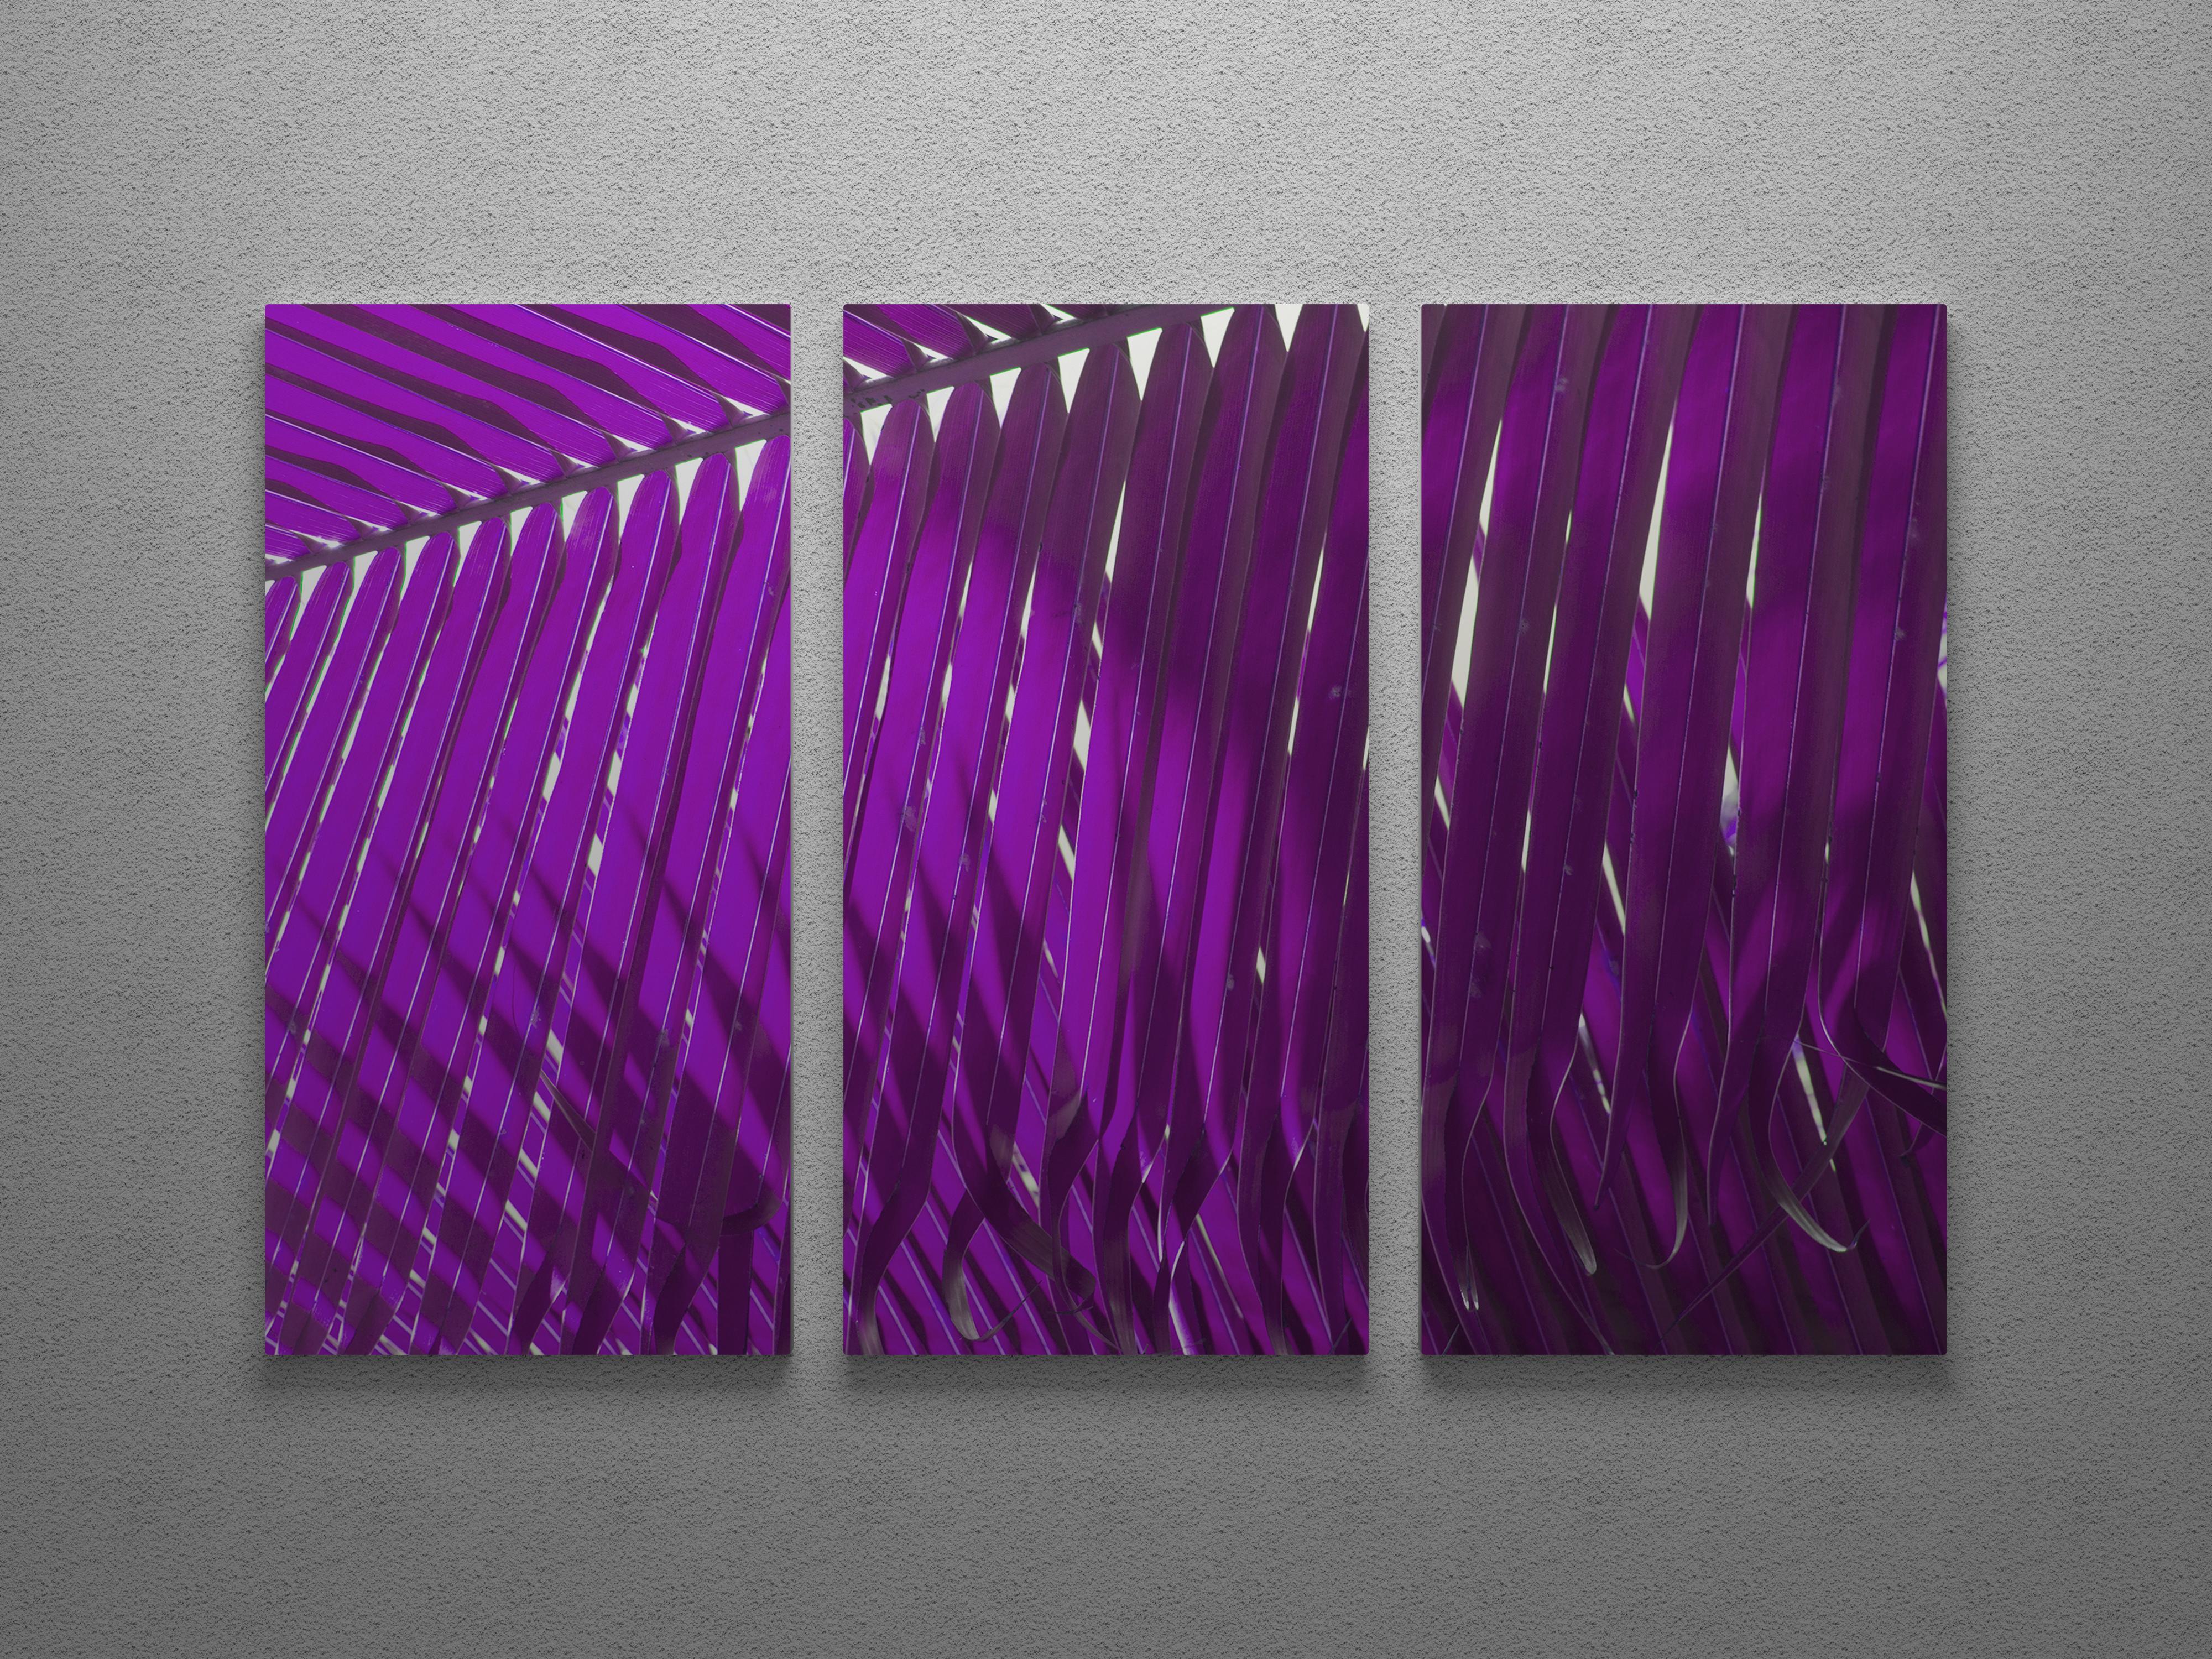 Magenta palm frond triptych